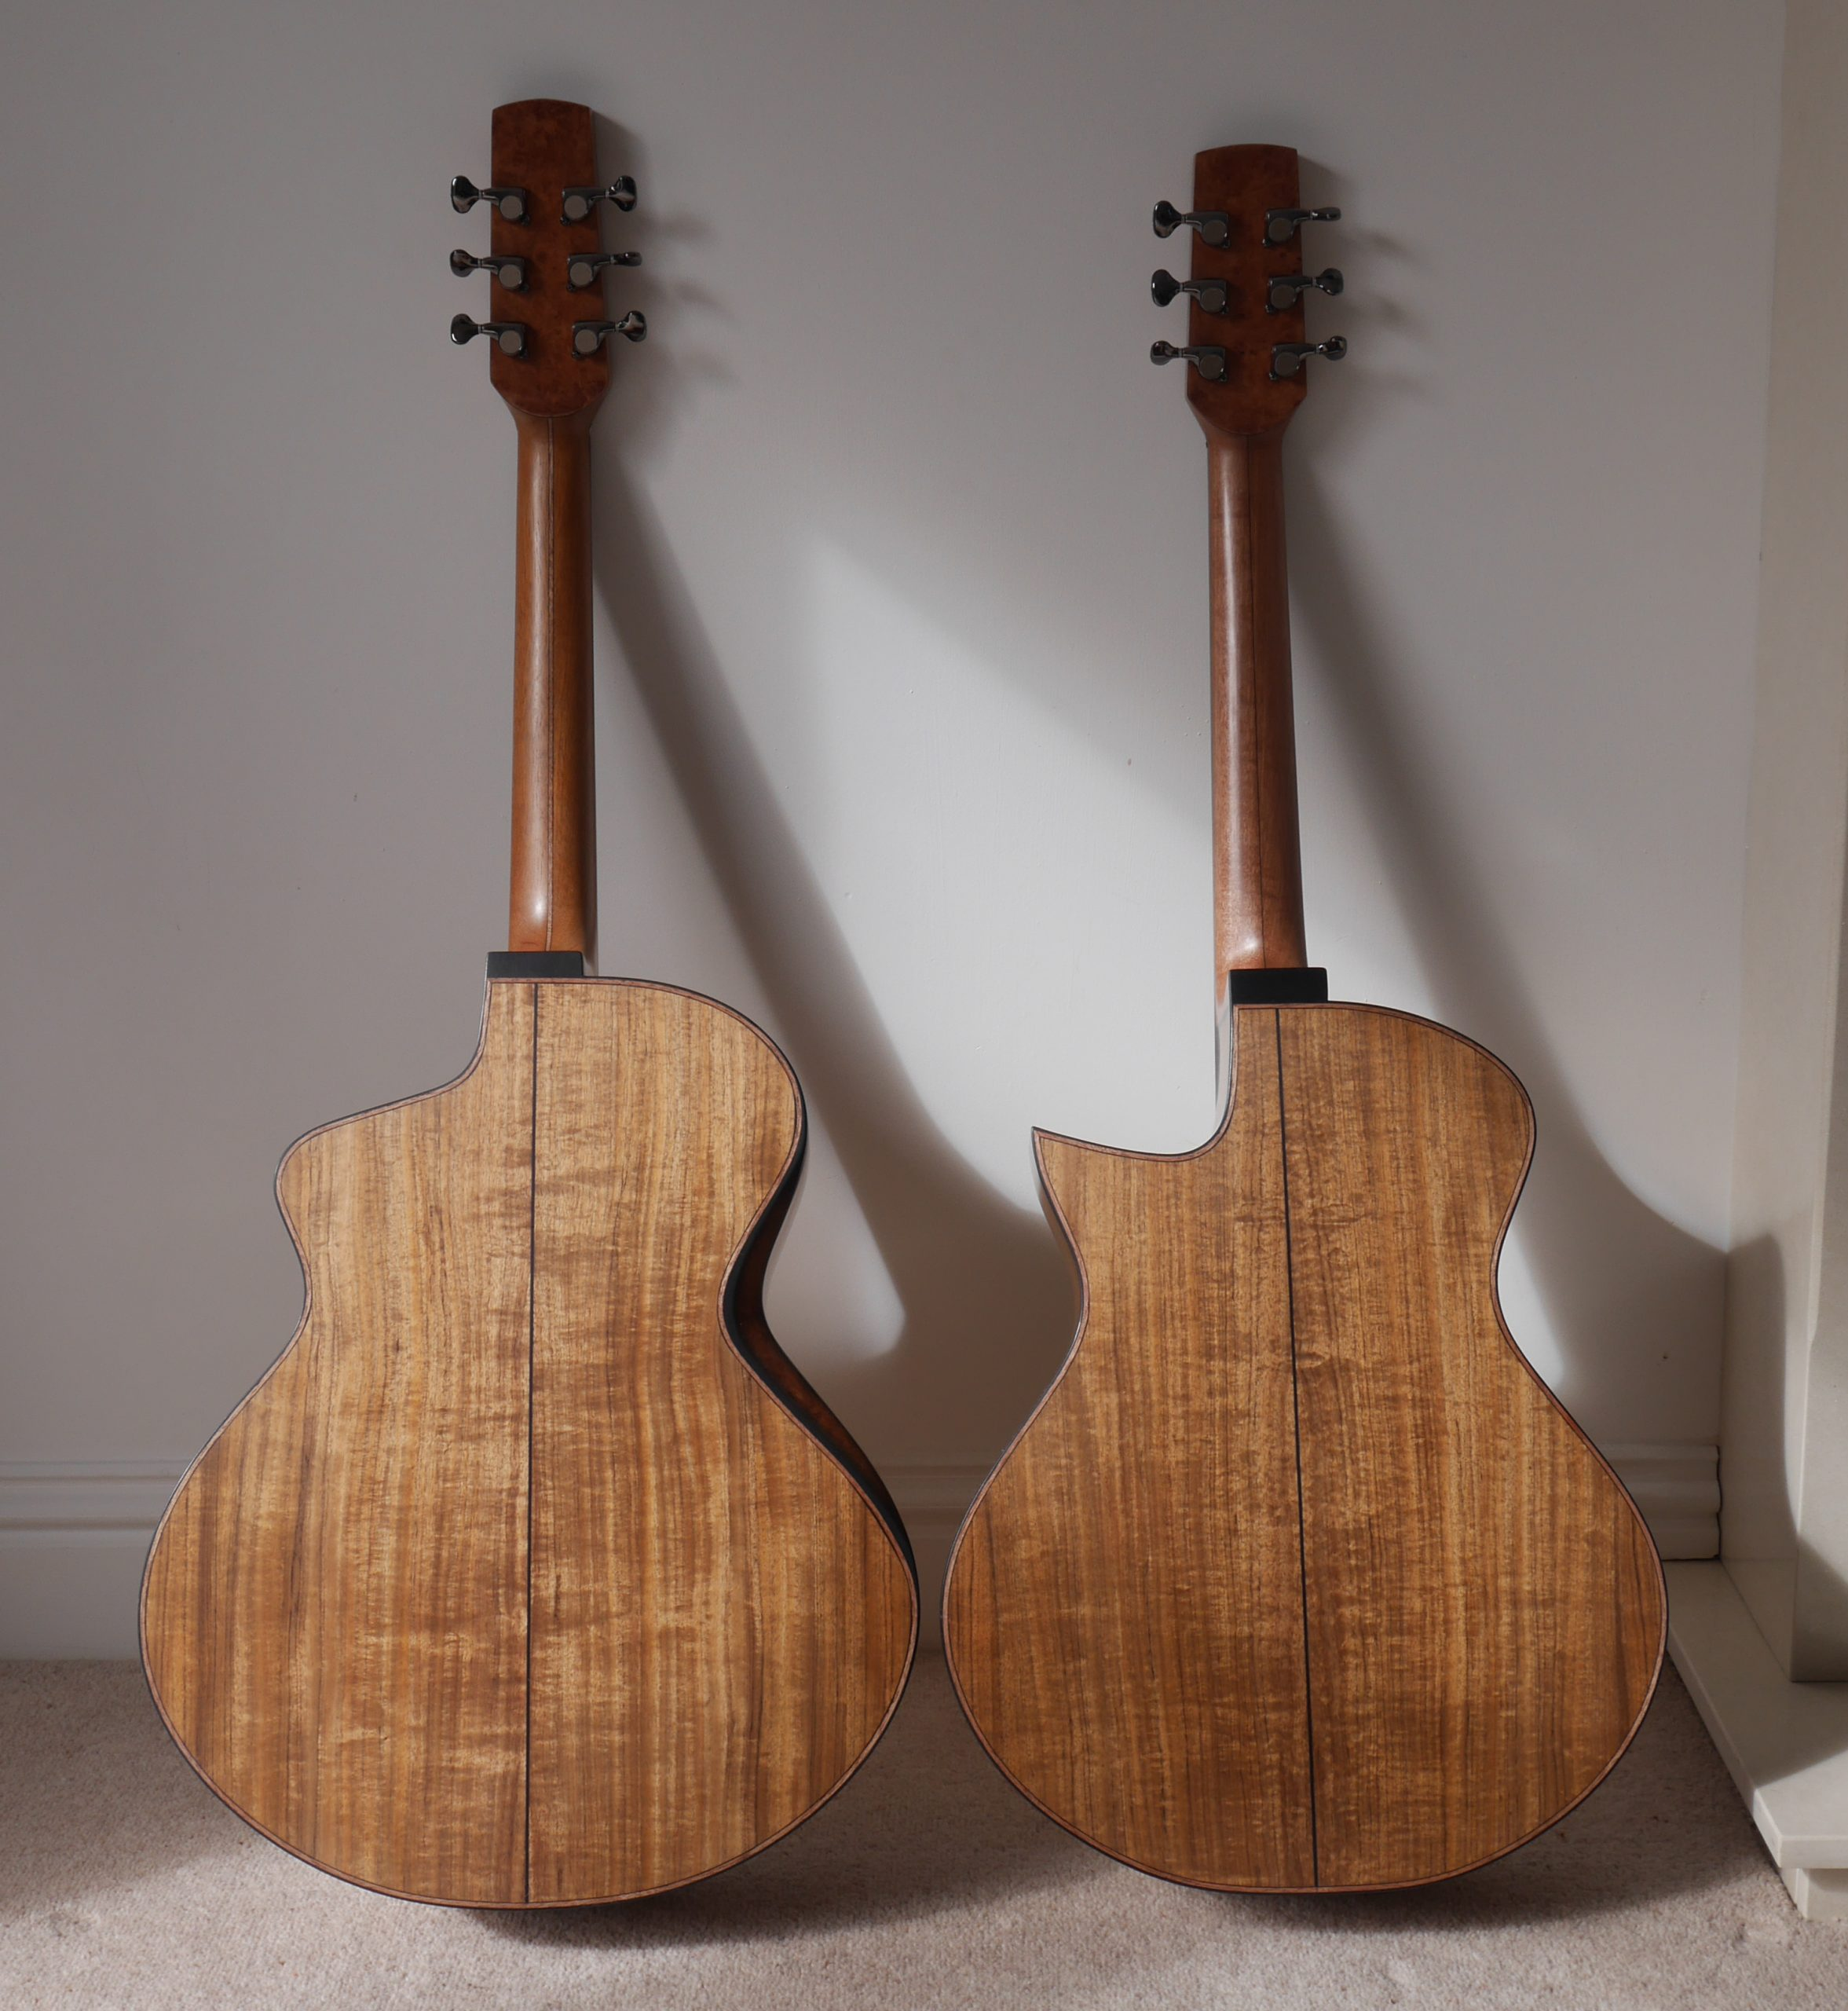 tasmanian blackwood, jumbo, grand concert, acoustic guitar, luthier, montgomery guitars, andreas Montgomery